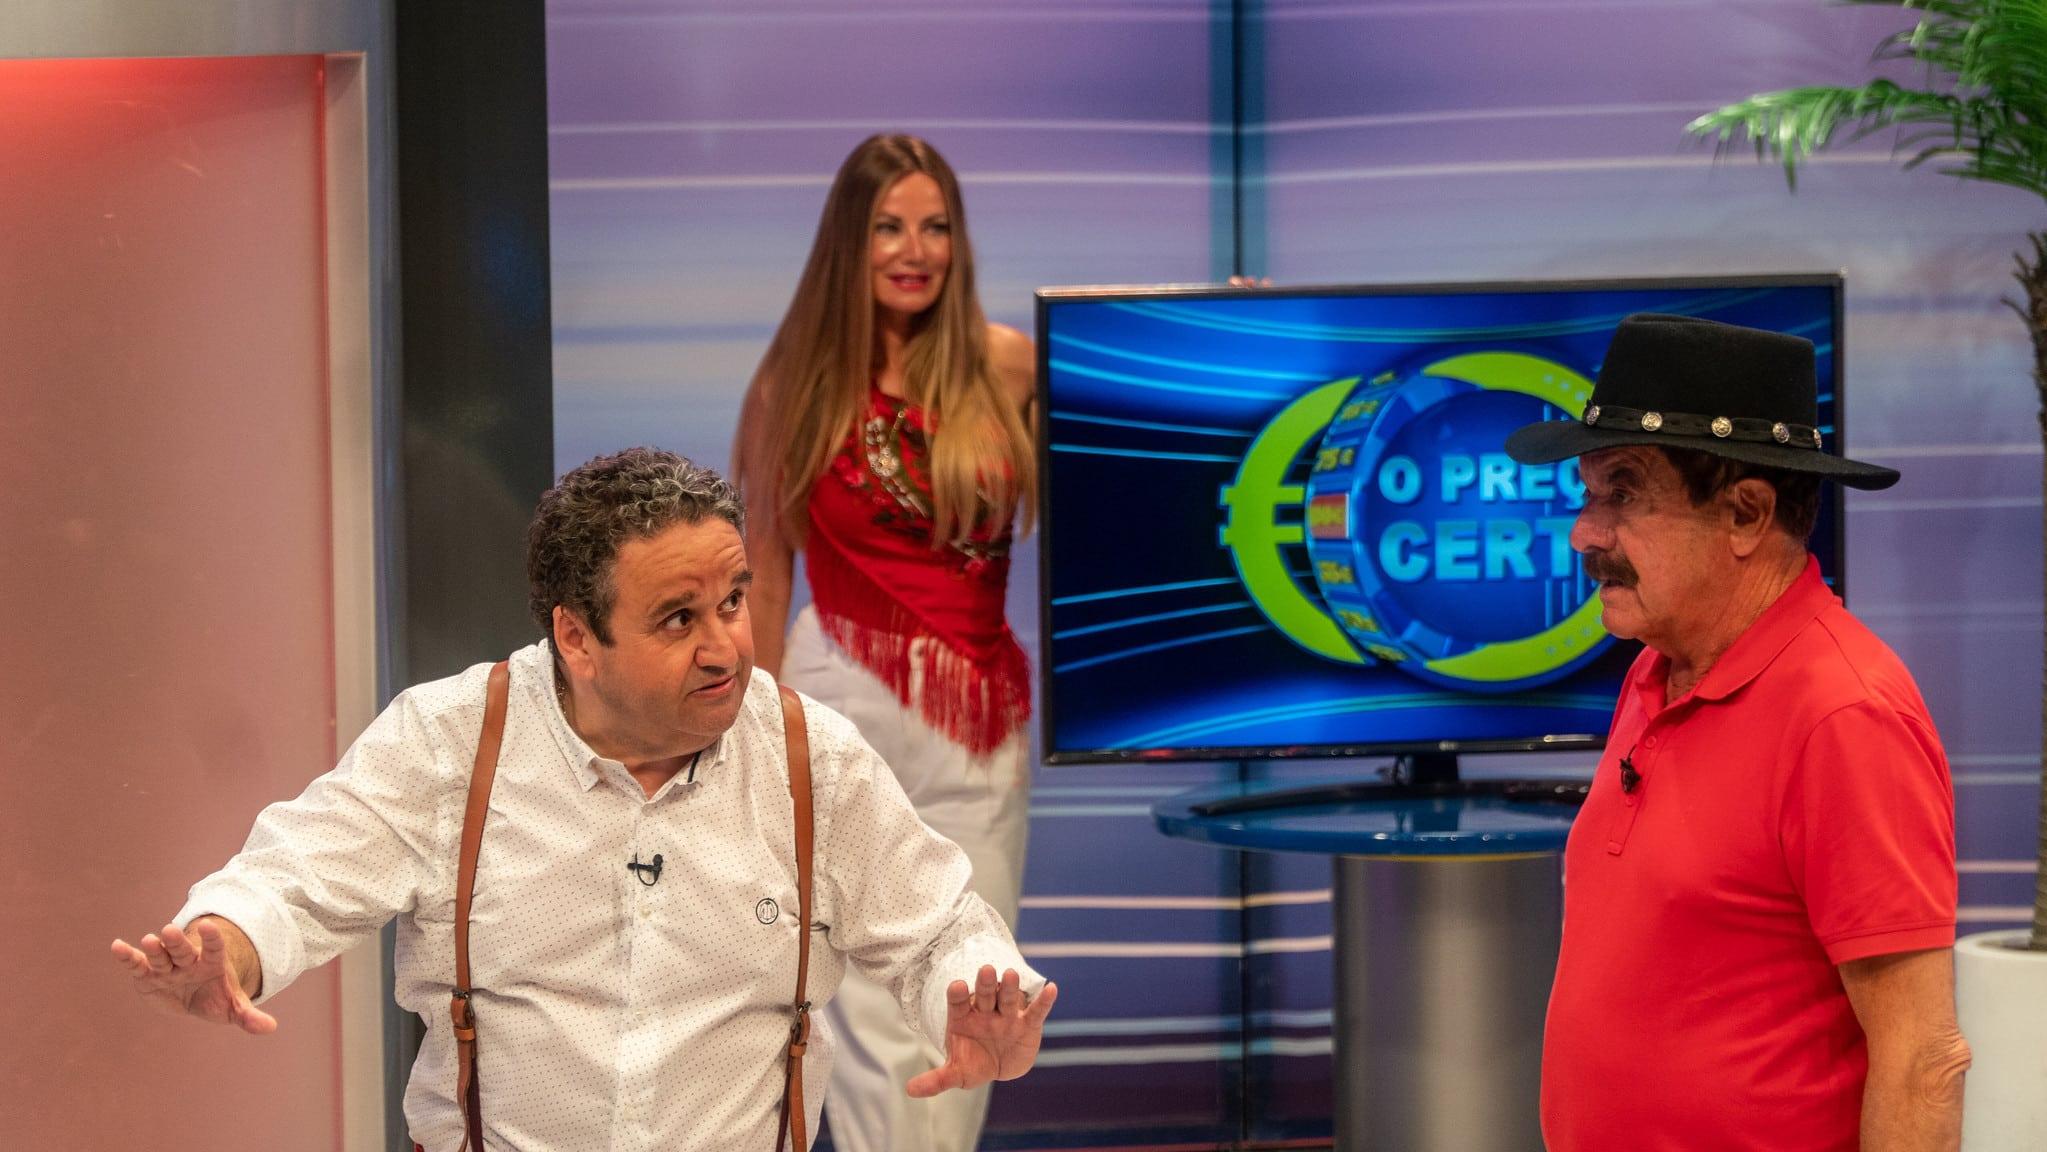 O-Preco-Certo-Fernando-Mendes-2